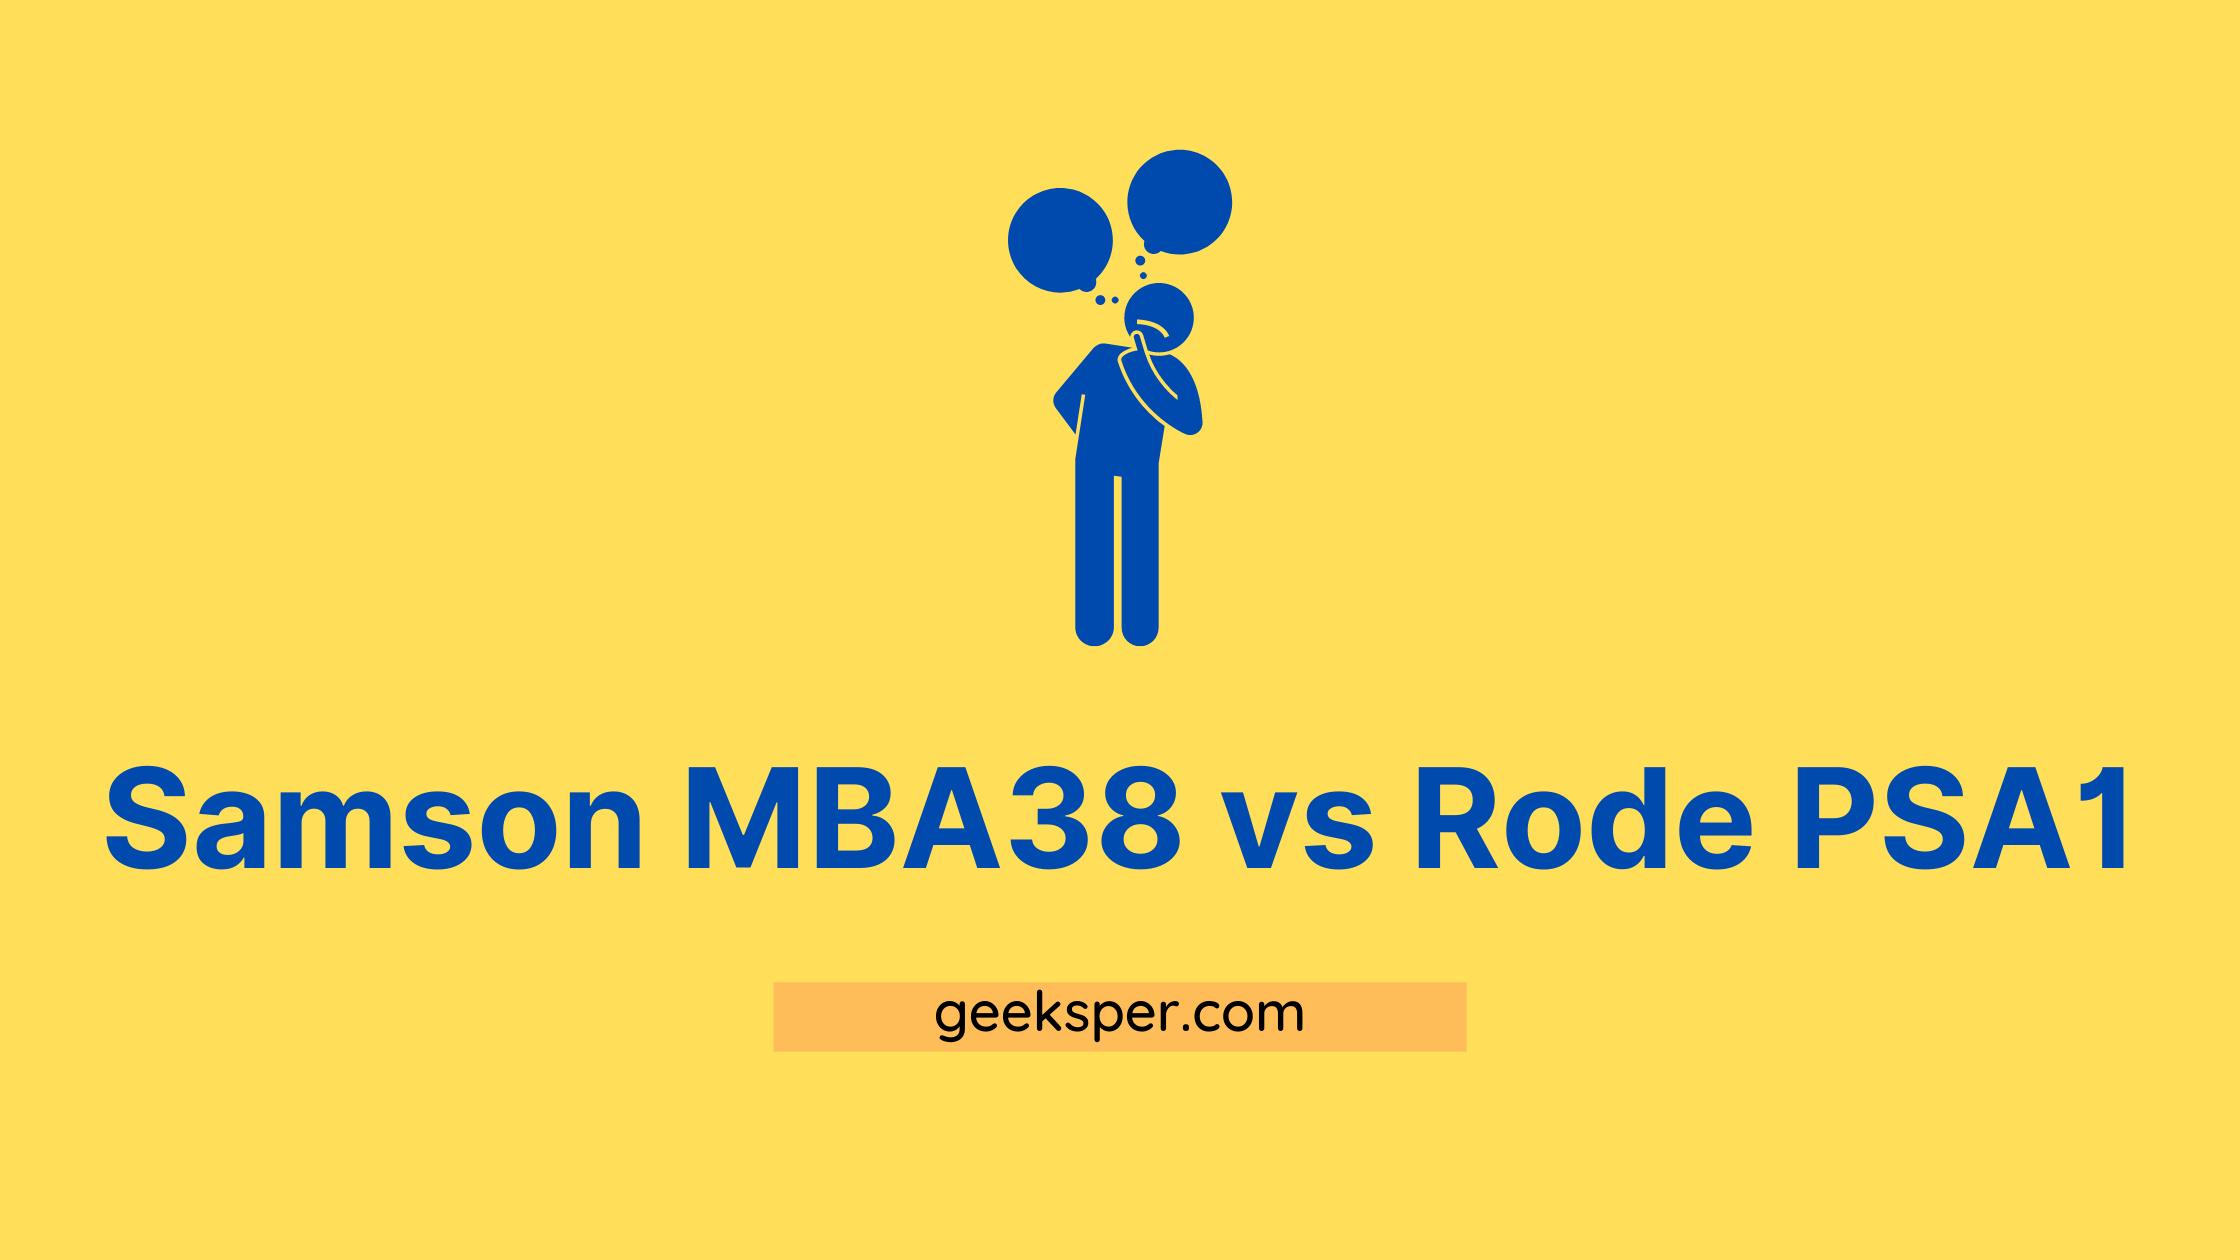 Samson MBA38 vs Rode PSA1: Boom Arms Comparison